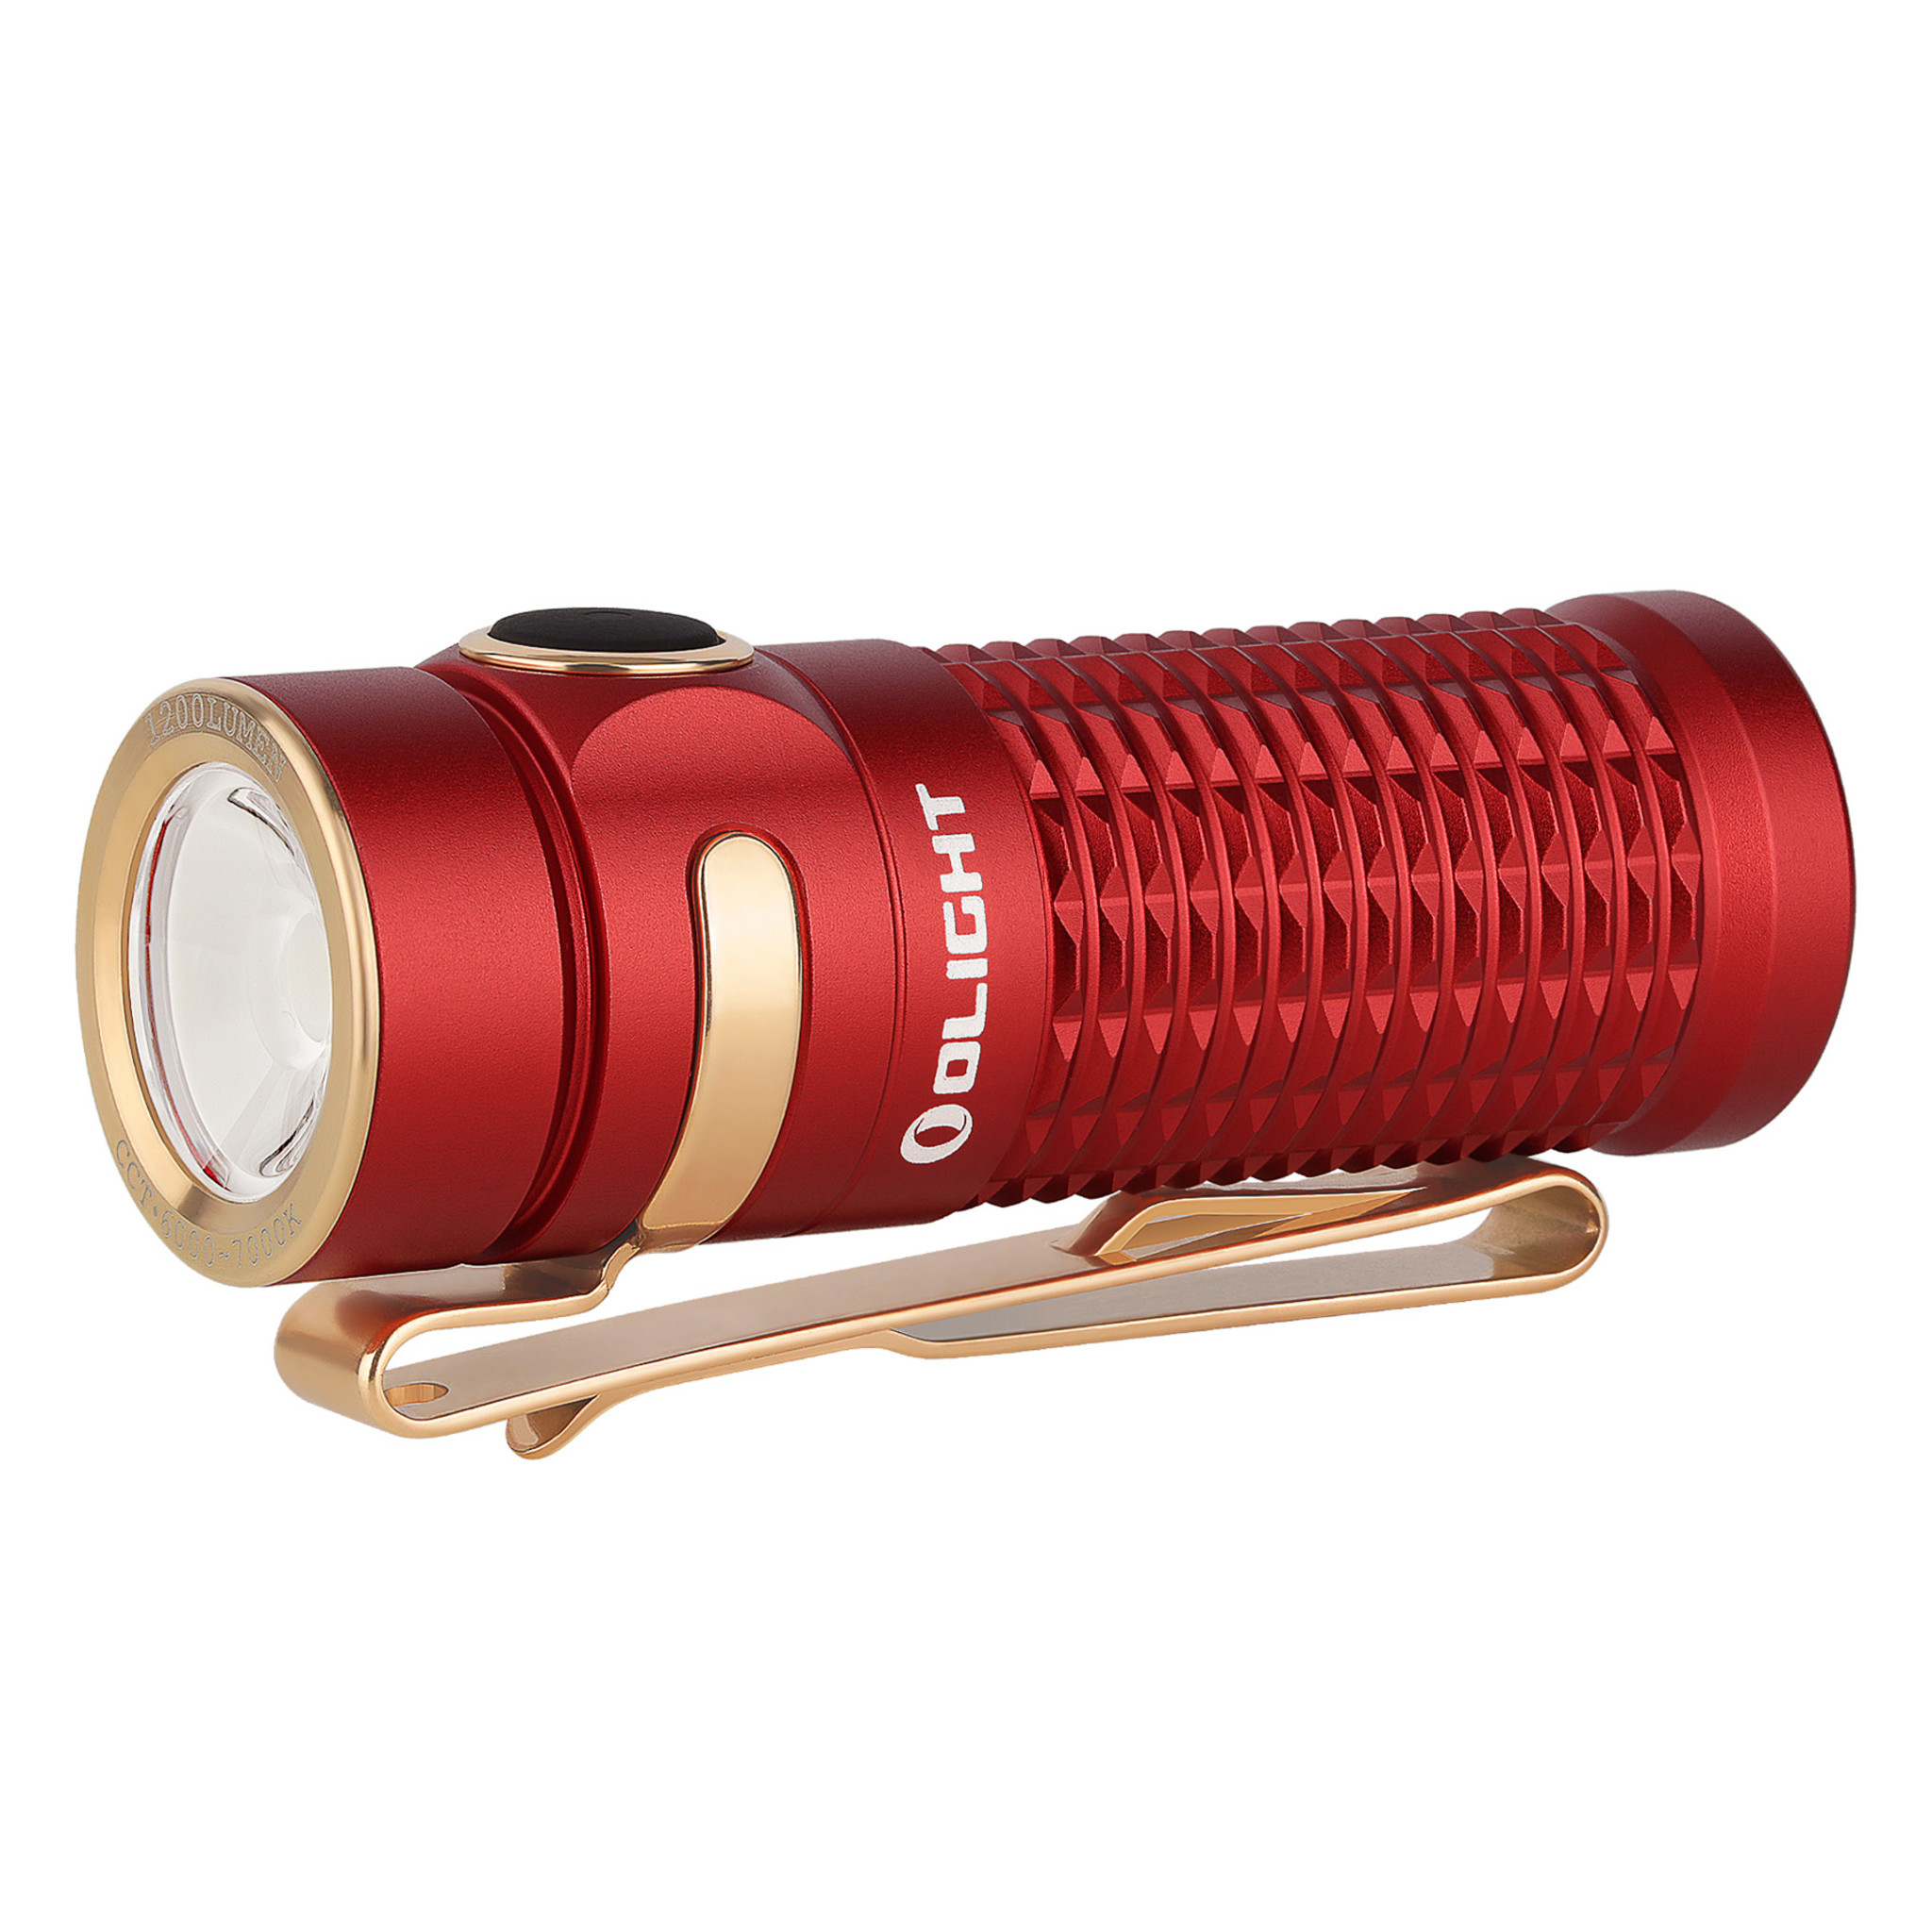 Olight Zaklamp Baton 3 - Red - Max 1200 Lumen